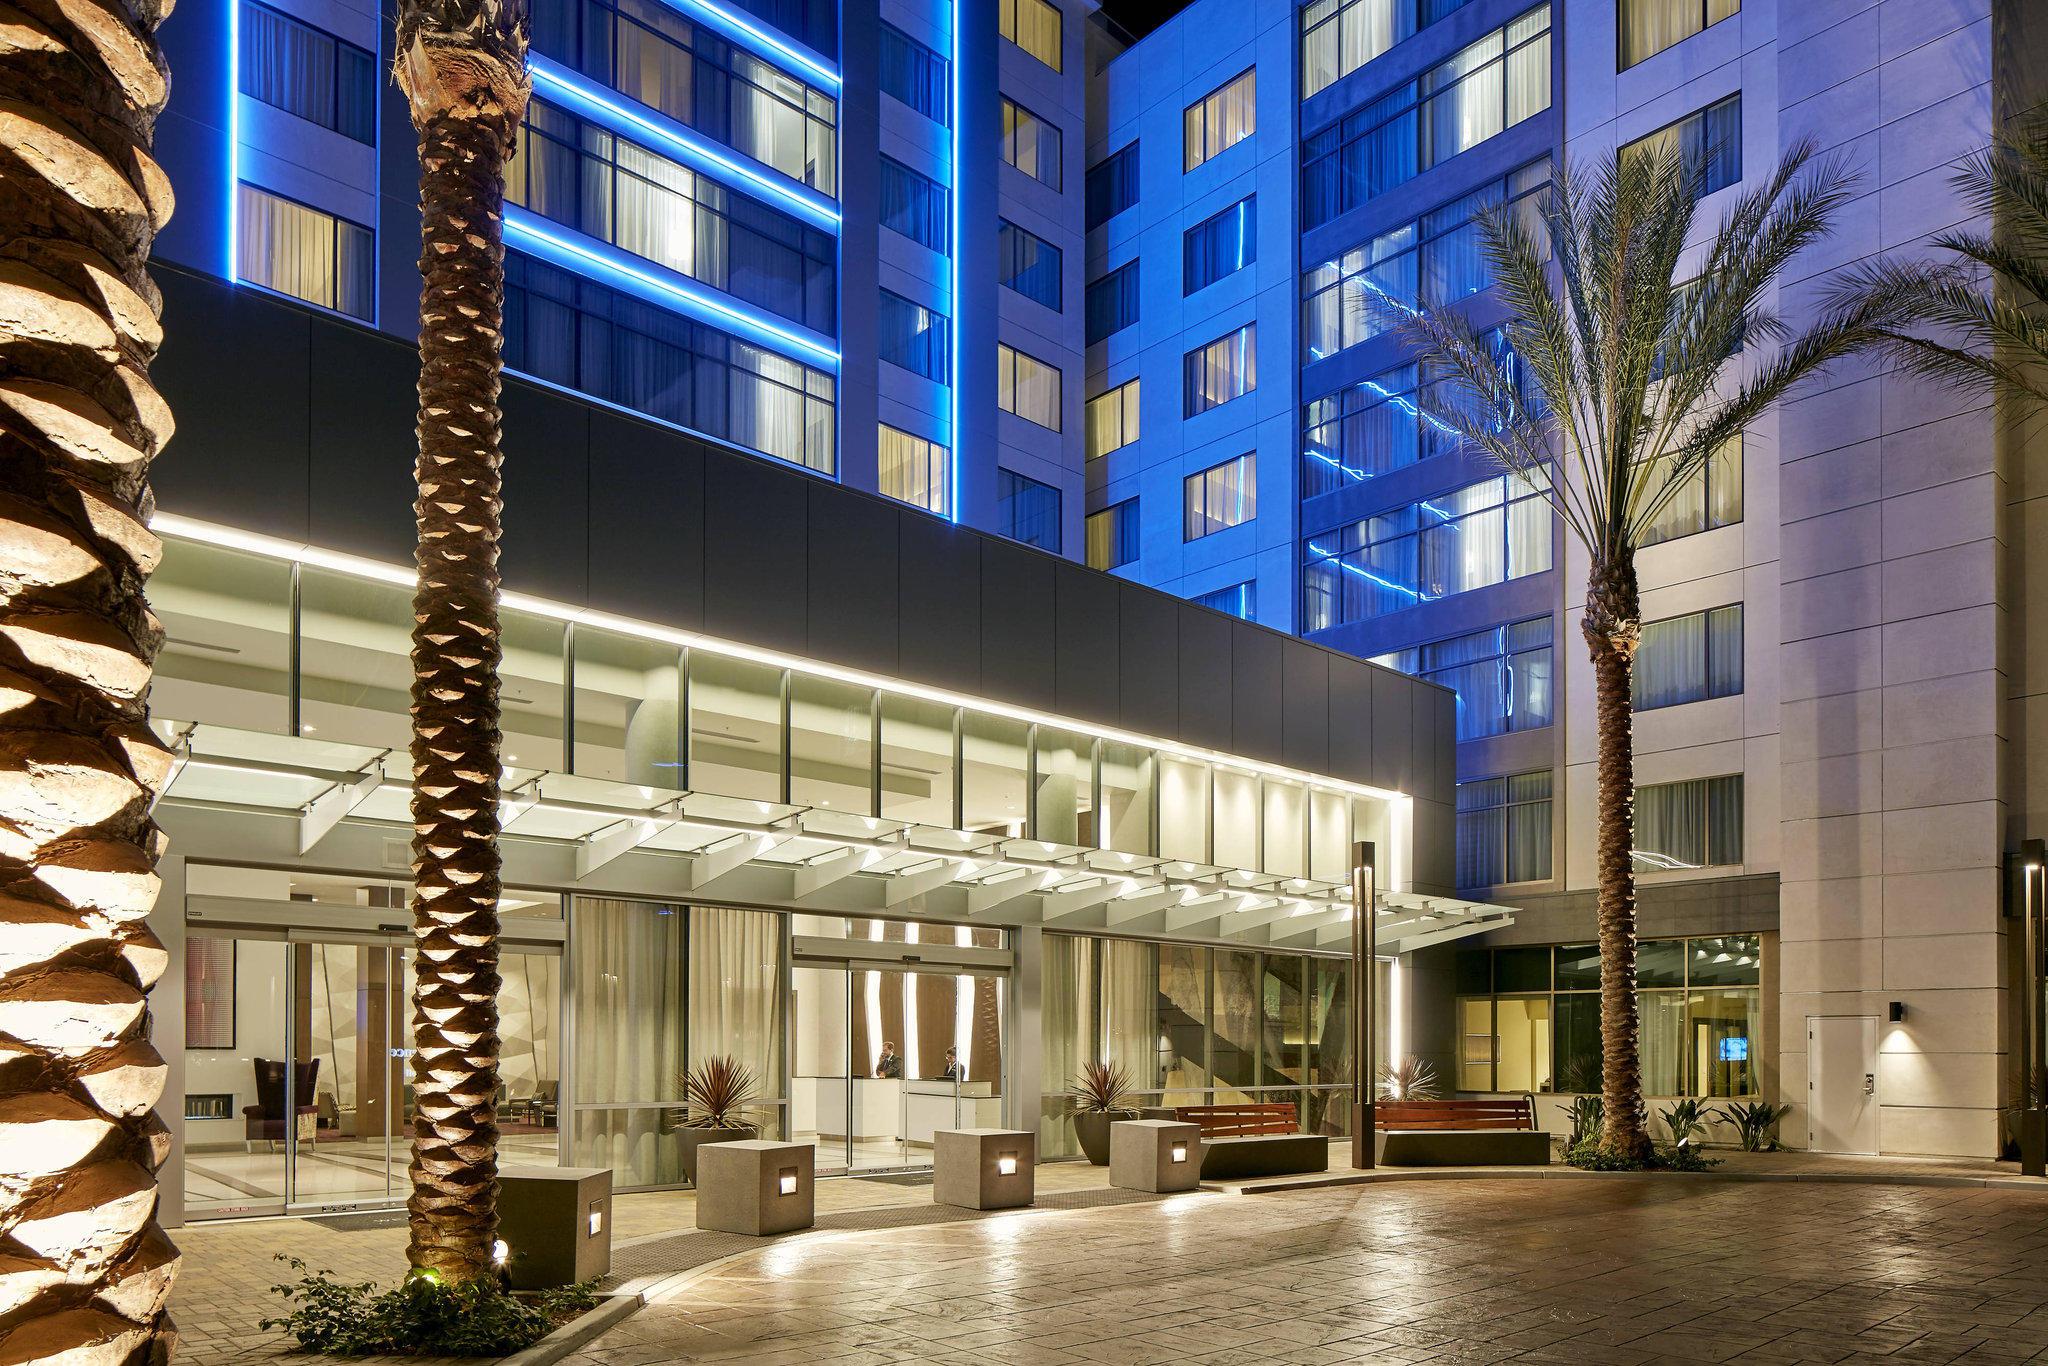 Residence Inn by Marriott at Anaheim Resort/Convention Center